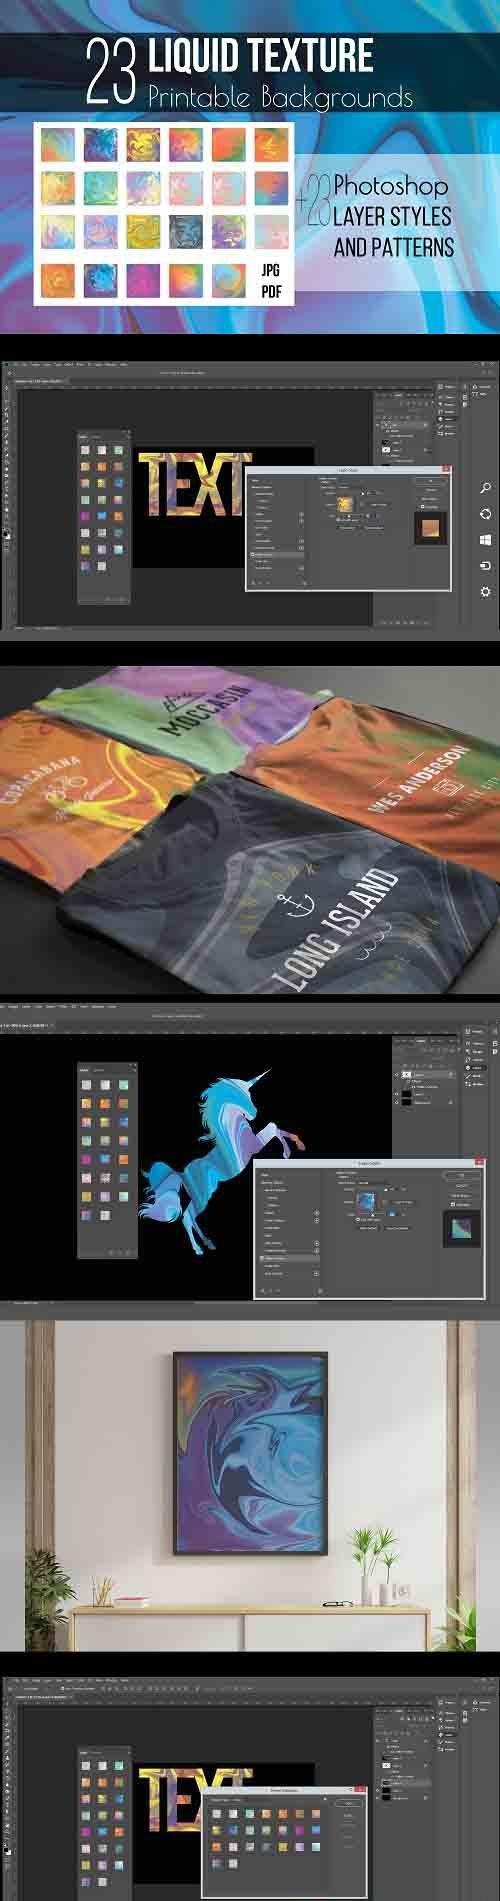 Liquid texture & Photoshop Layer Styles - 1268816